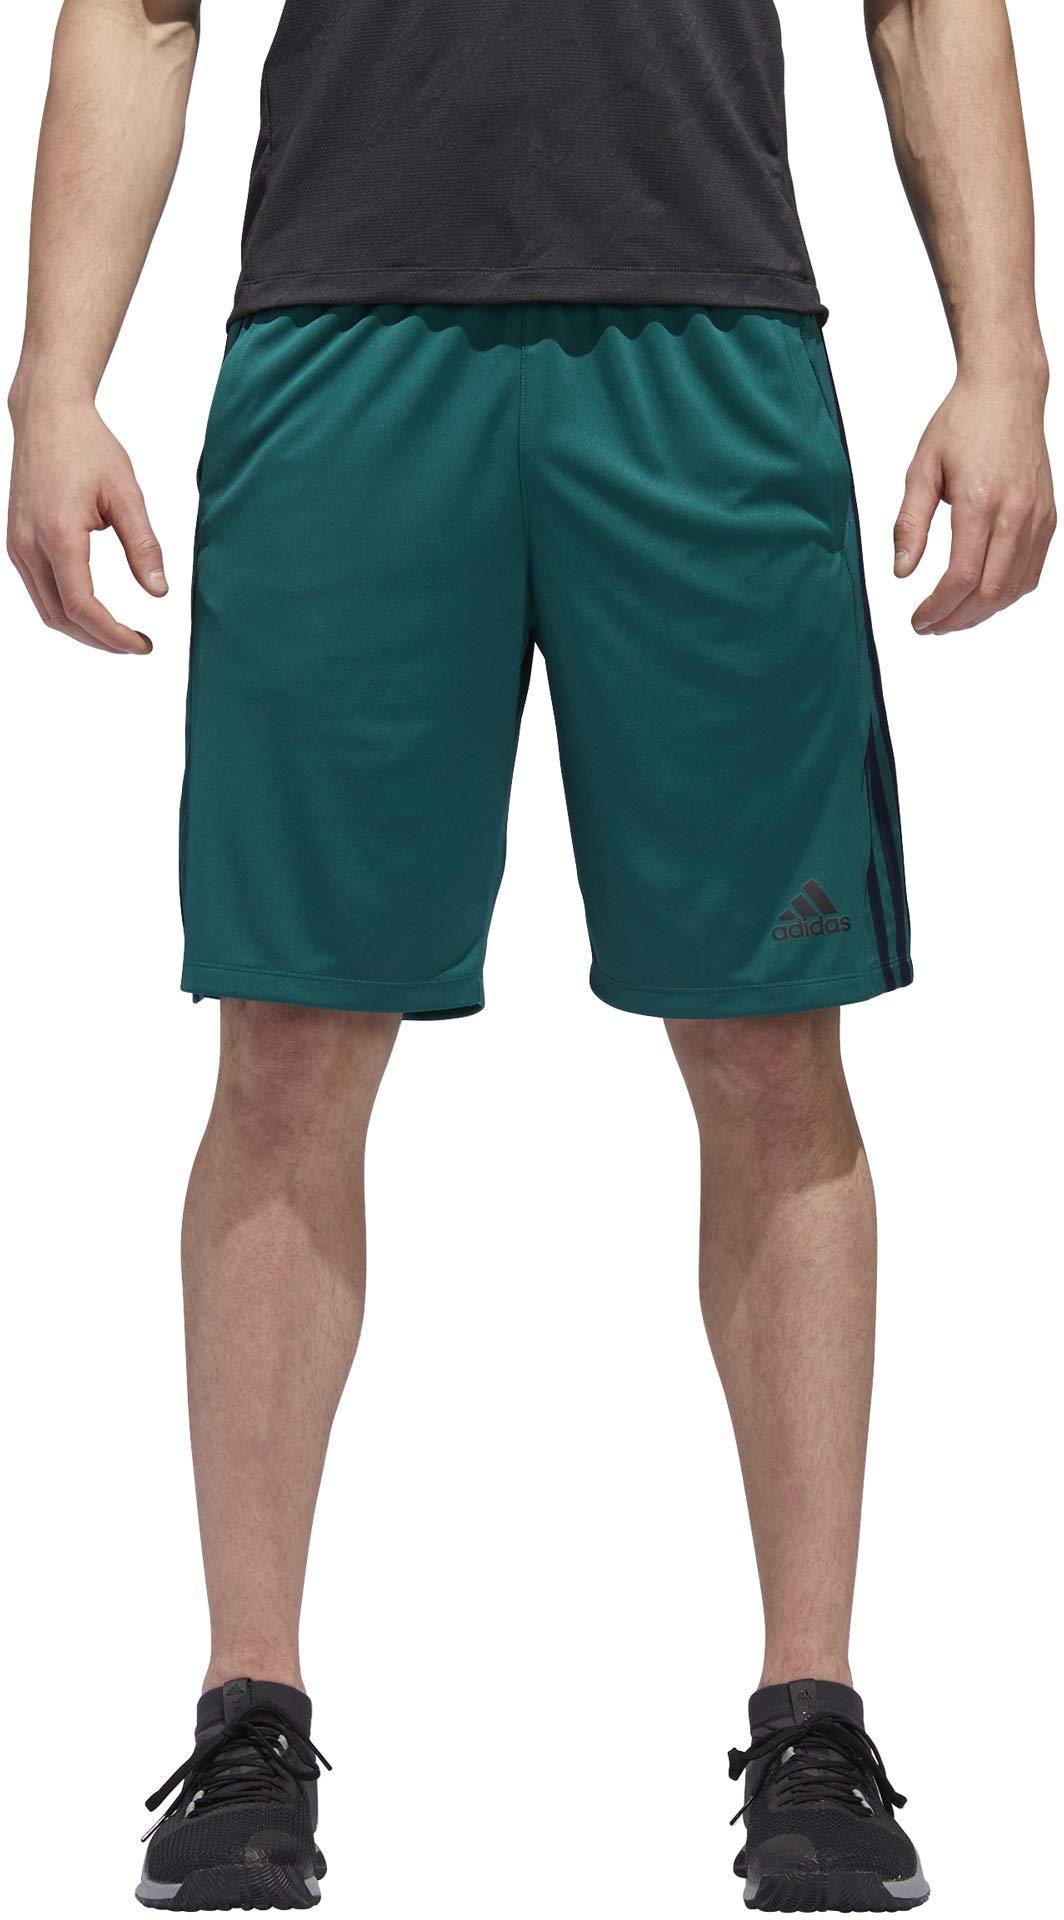 adidas Men's Designed-2-Move Shorts (Small, Noble Green/Collegiate Navy)